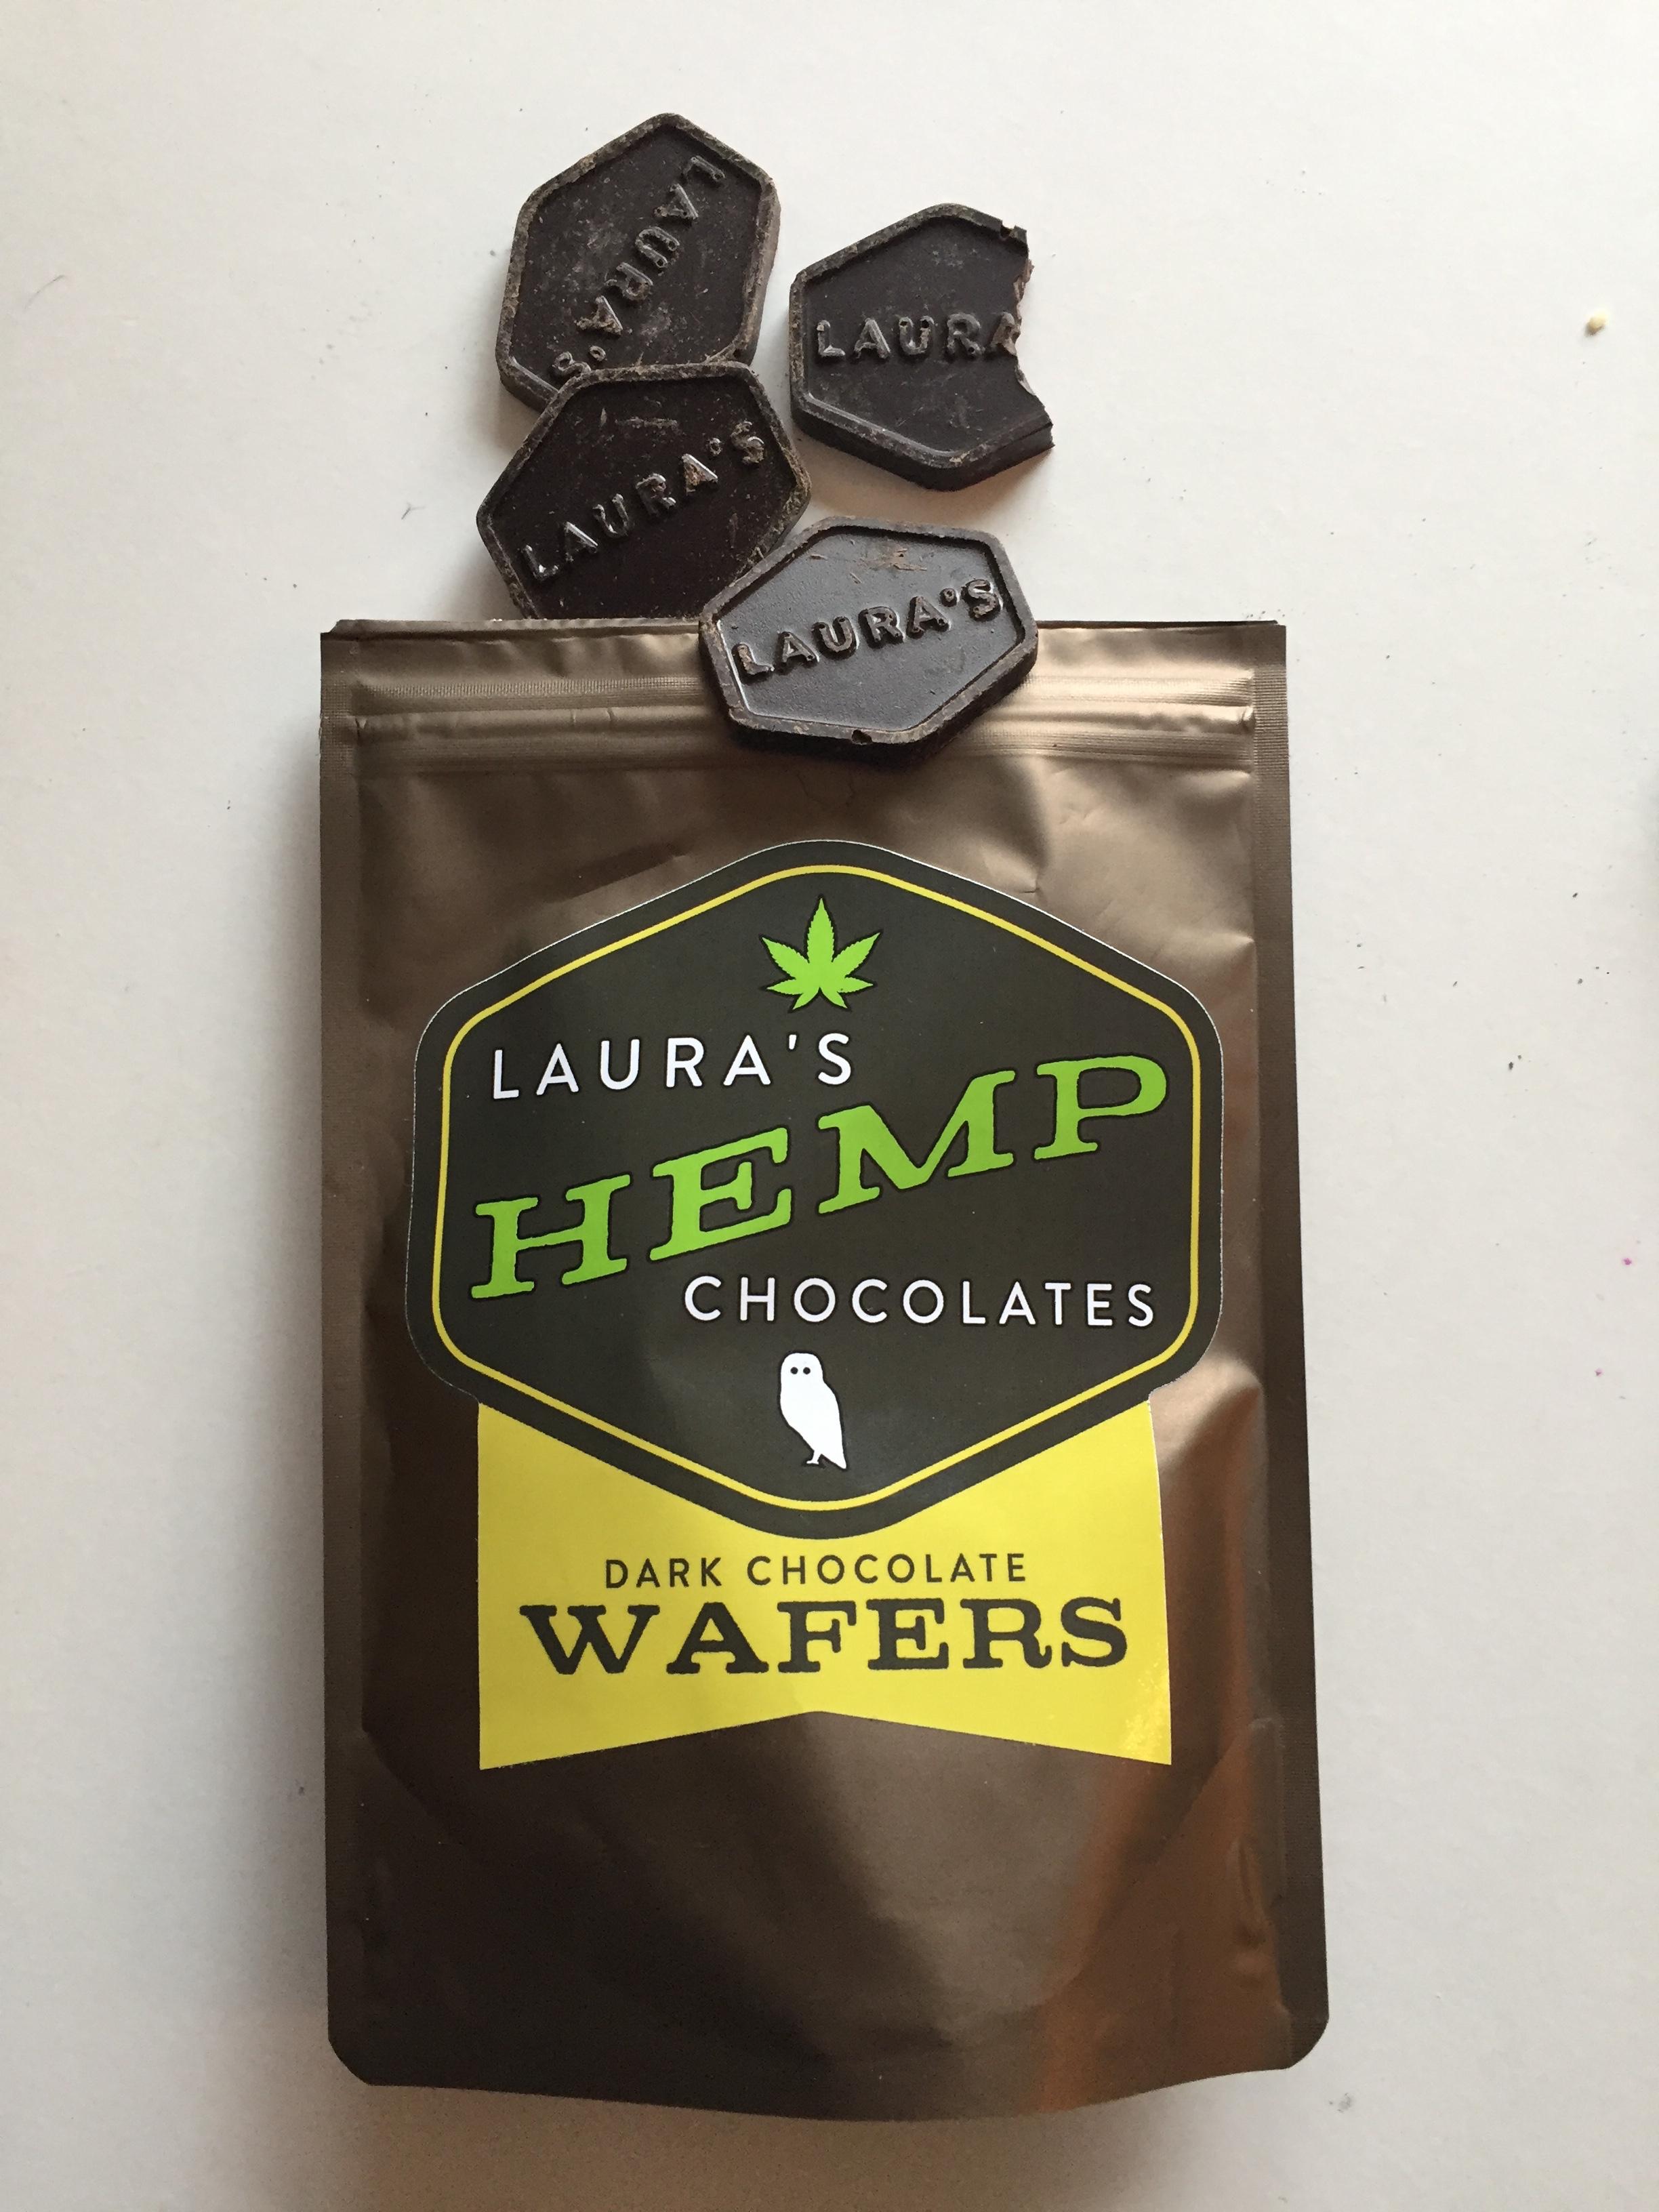 Laura's Hemp Chocolates from Winchester, Kentucky.